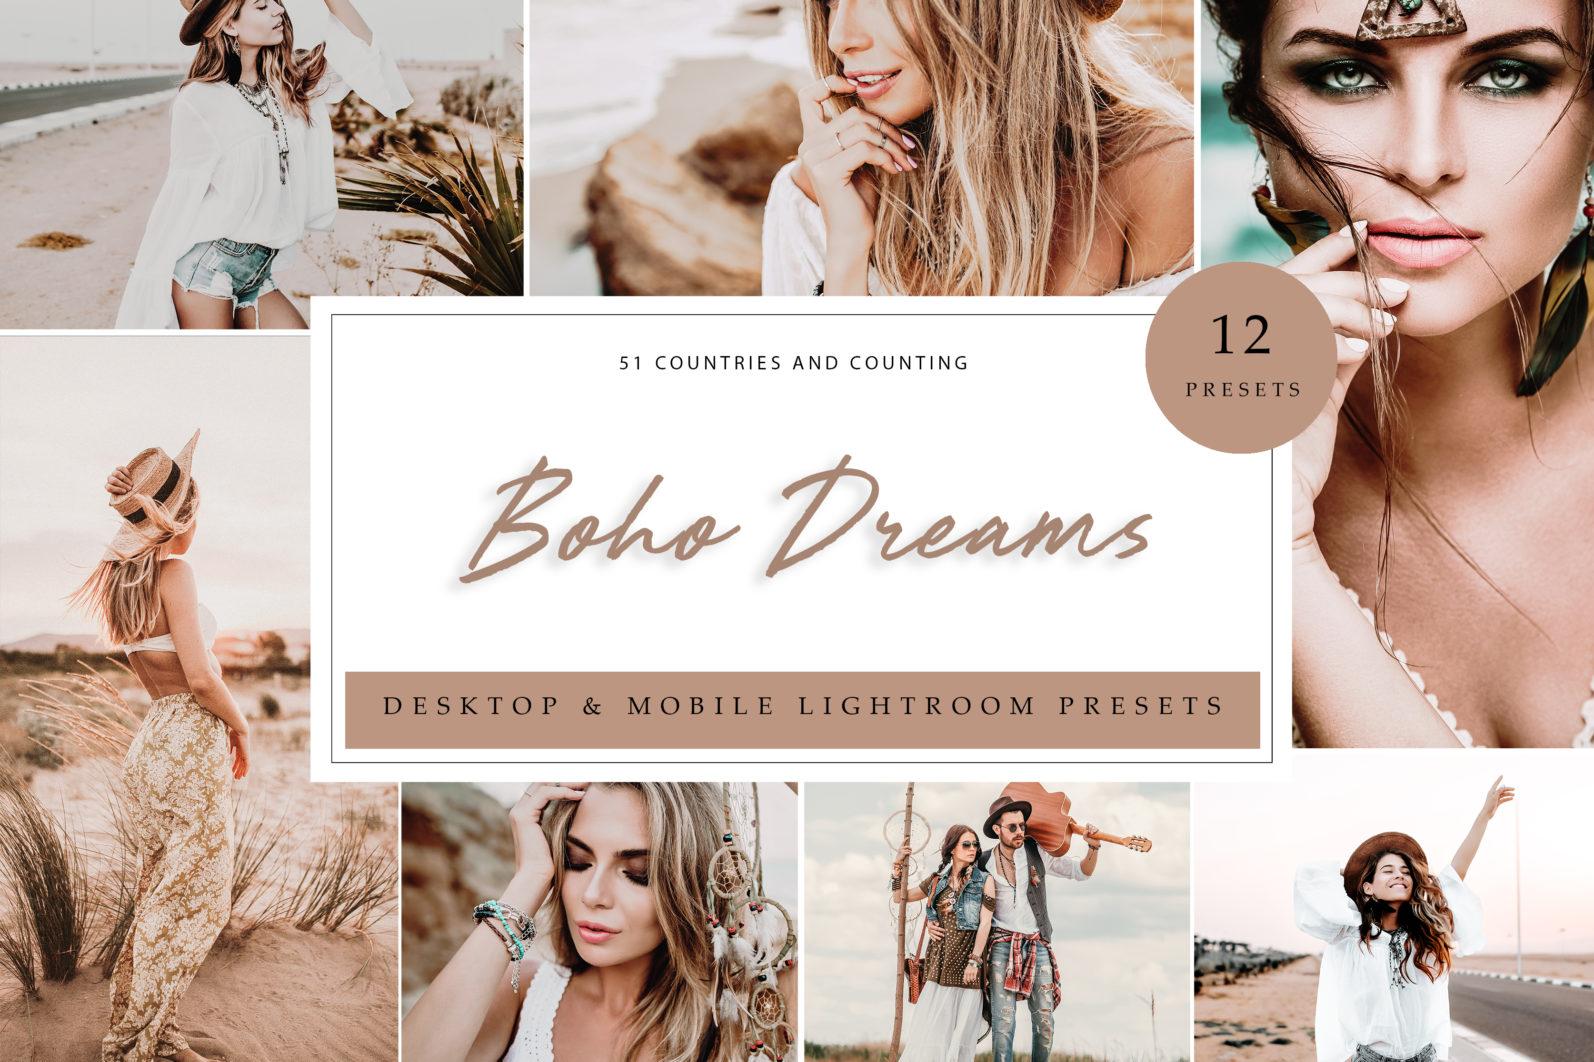 12 x Boho Dreams Lightroom Presets, Portrait Presets | Mobile and Desktop - Boho Dreams LR scaled -